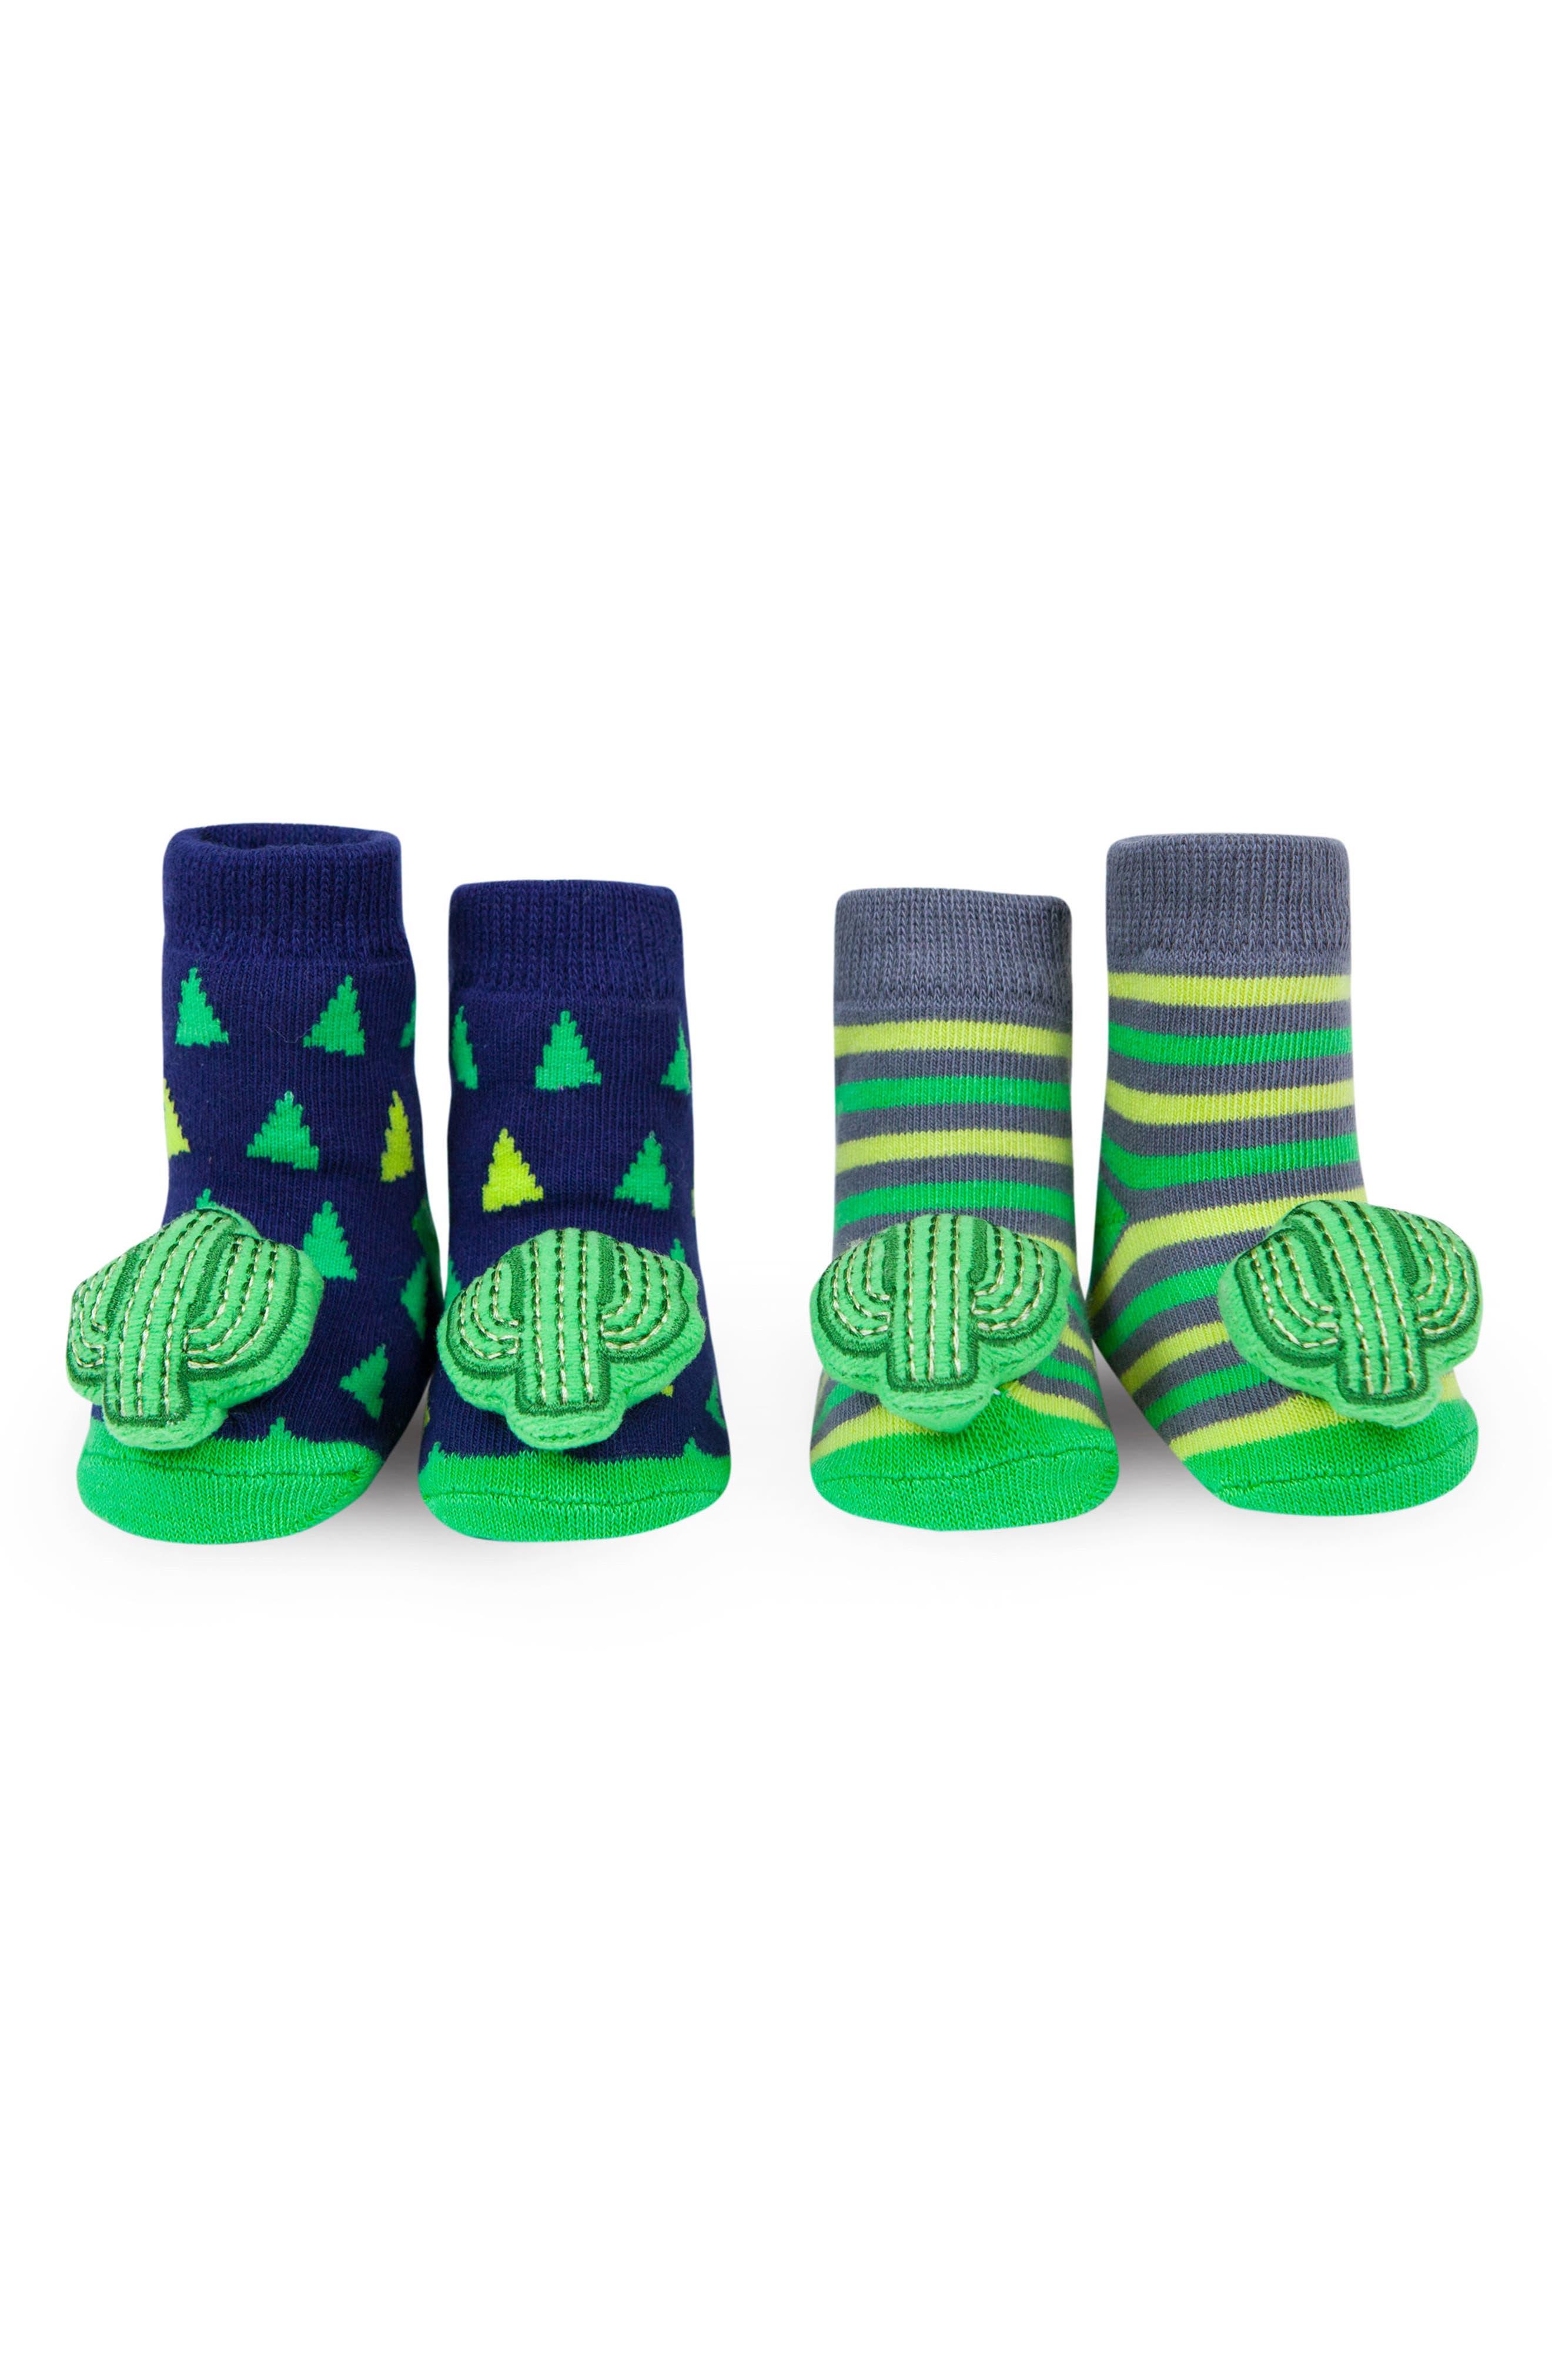 Cactus 2-Pack Rattle Socks,                         Main,                         color, Blue/ Green